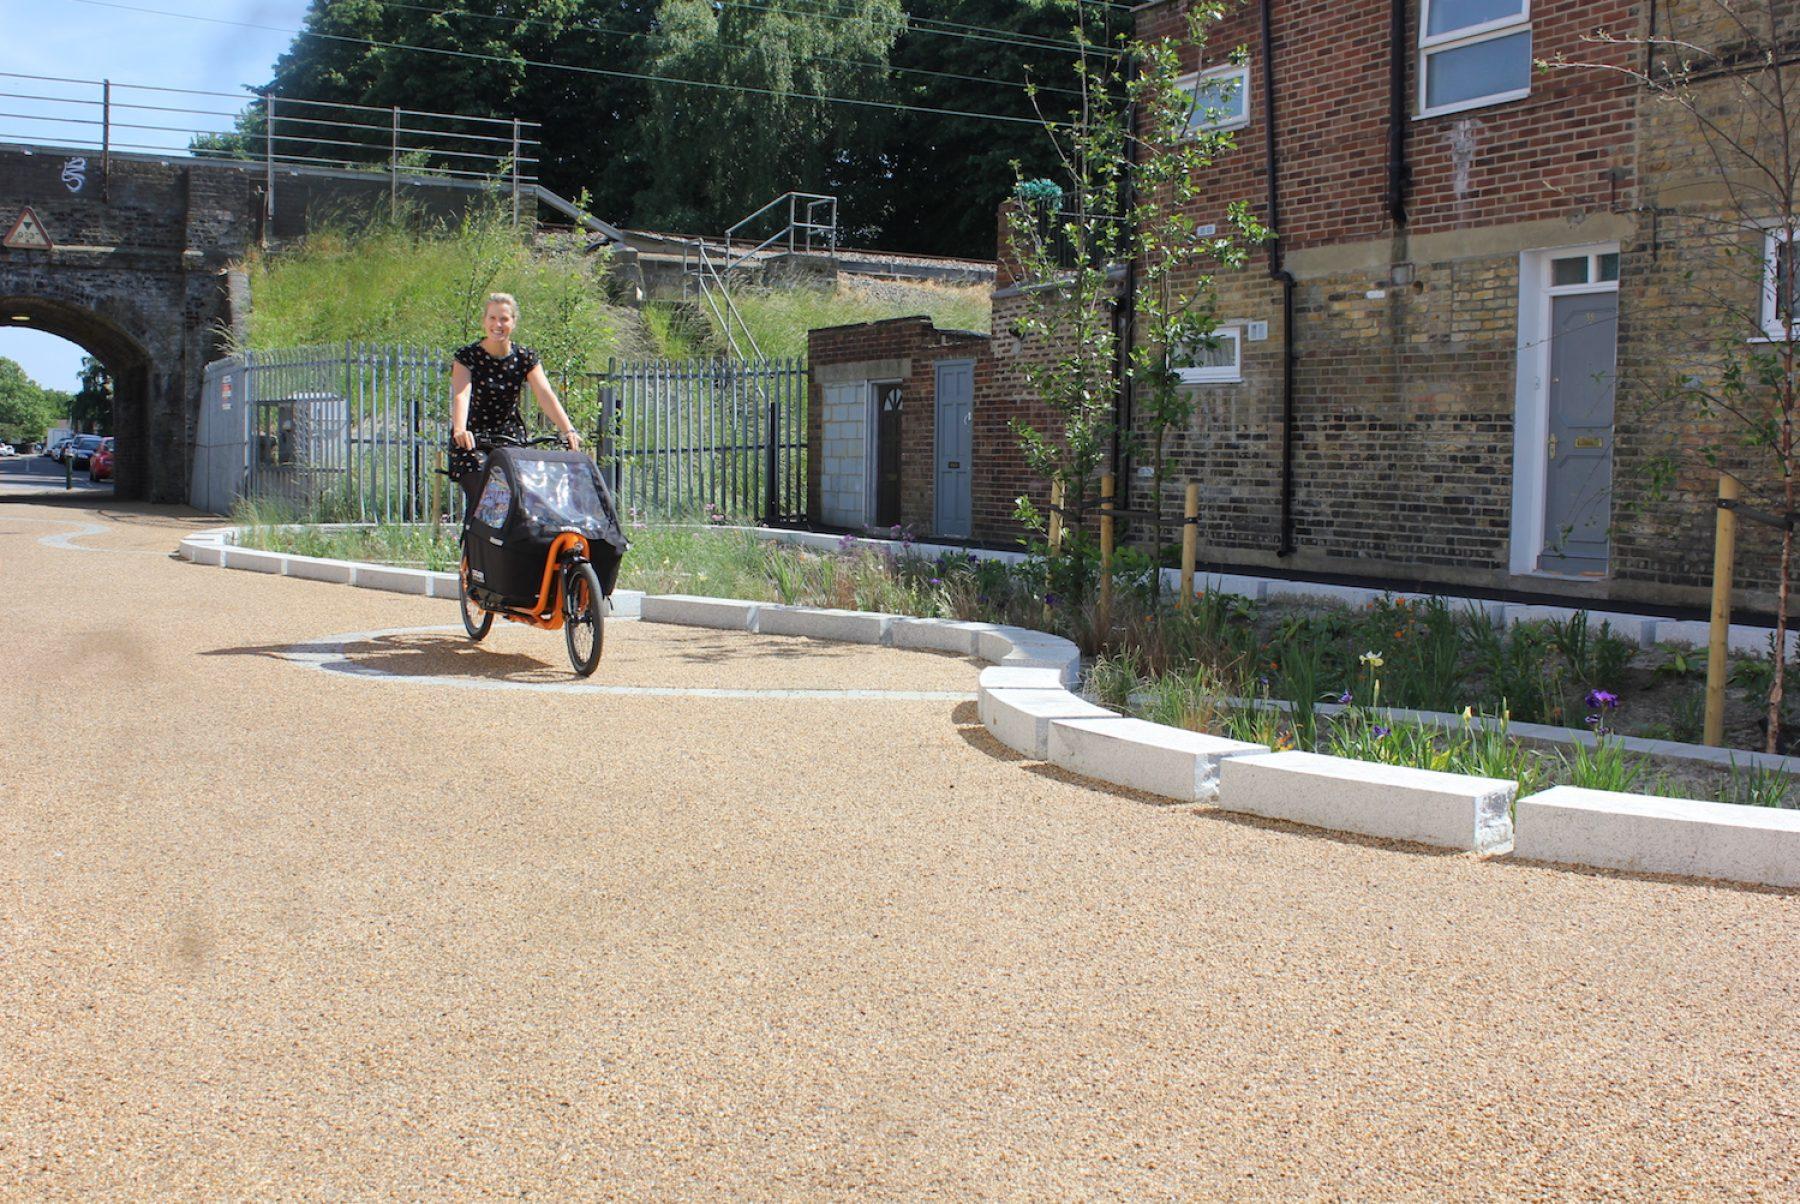 Image for London borough hails green transport scheme